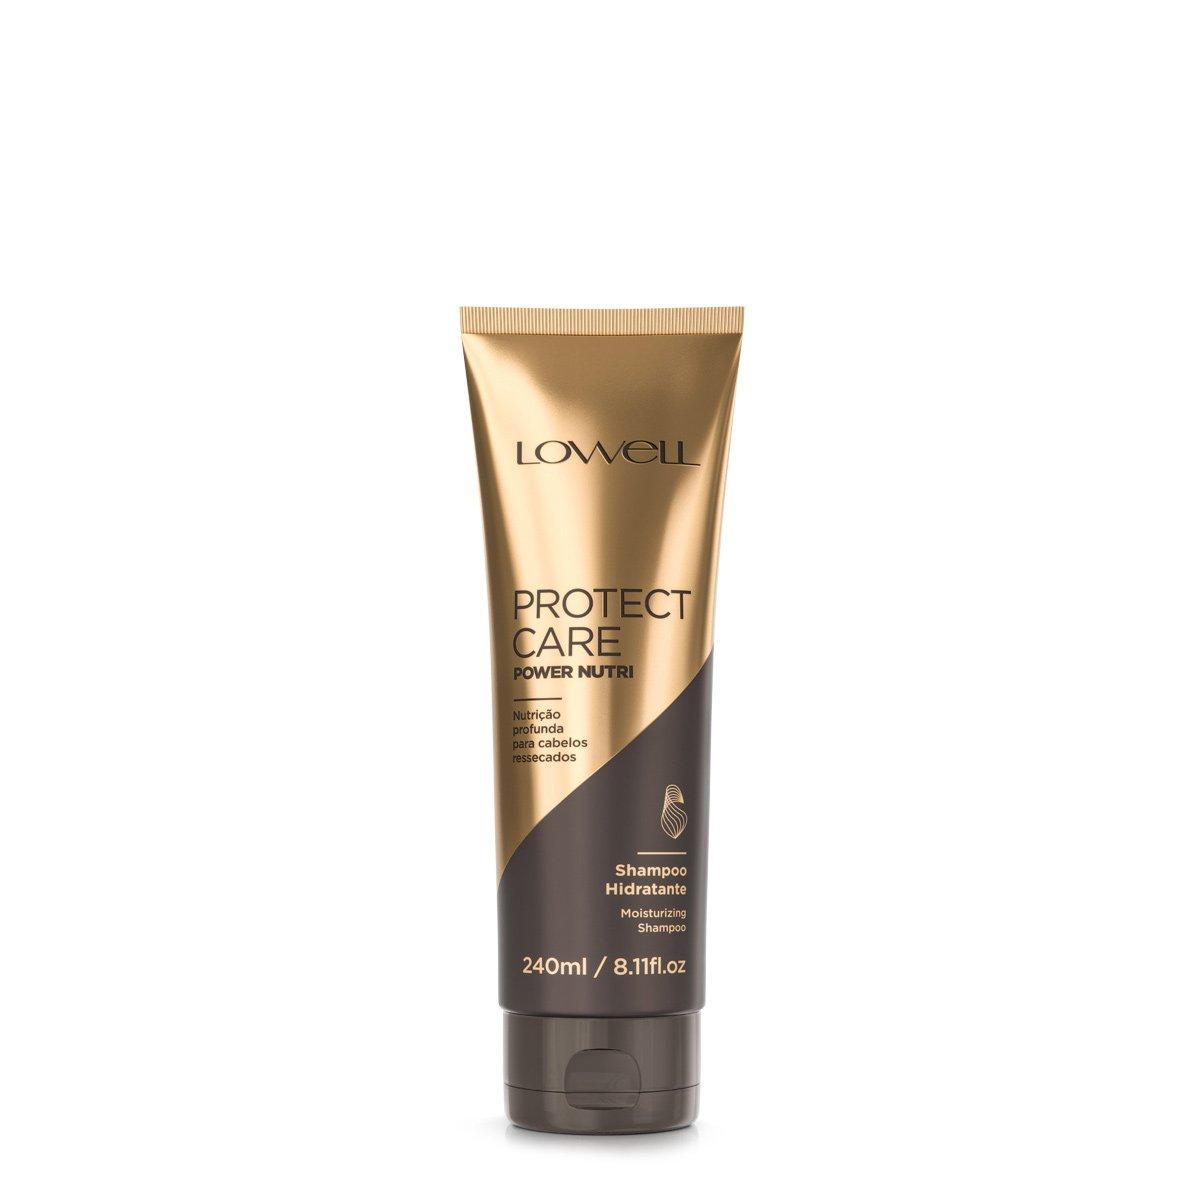 Shampoo Power Nutri Protect Care Lowell 240ml